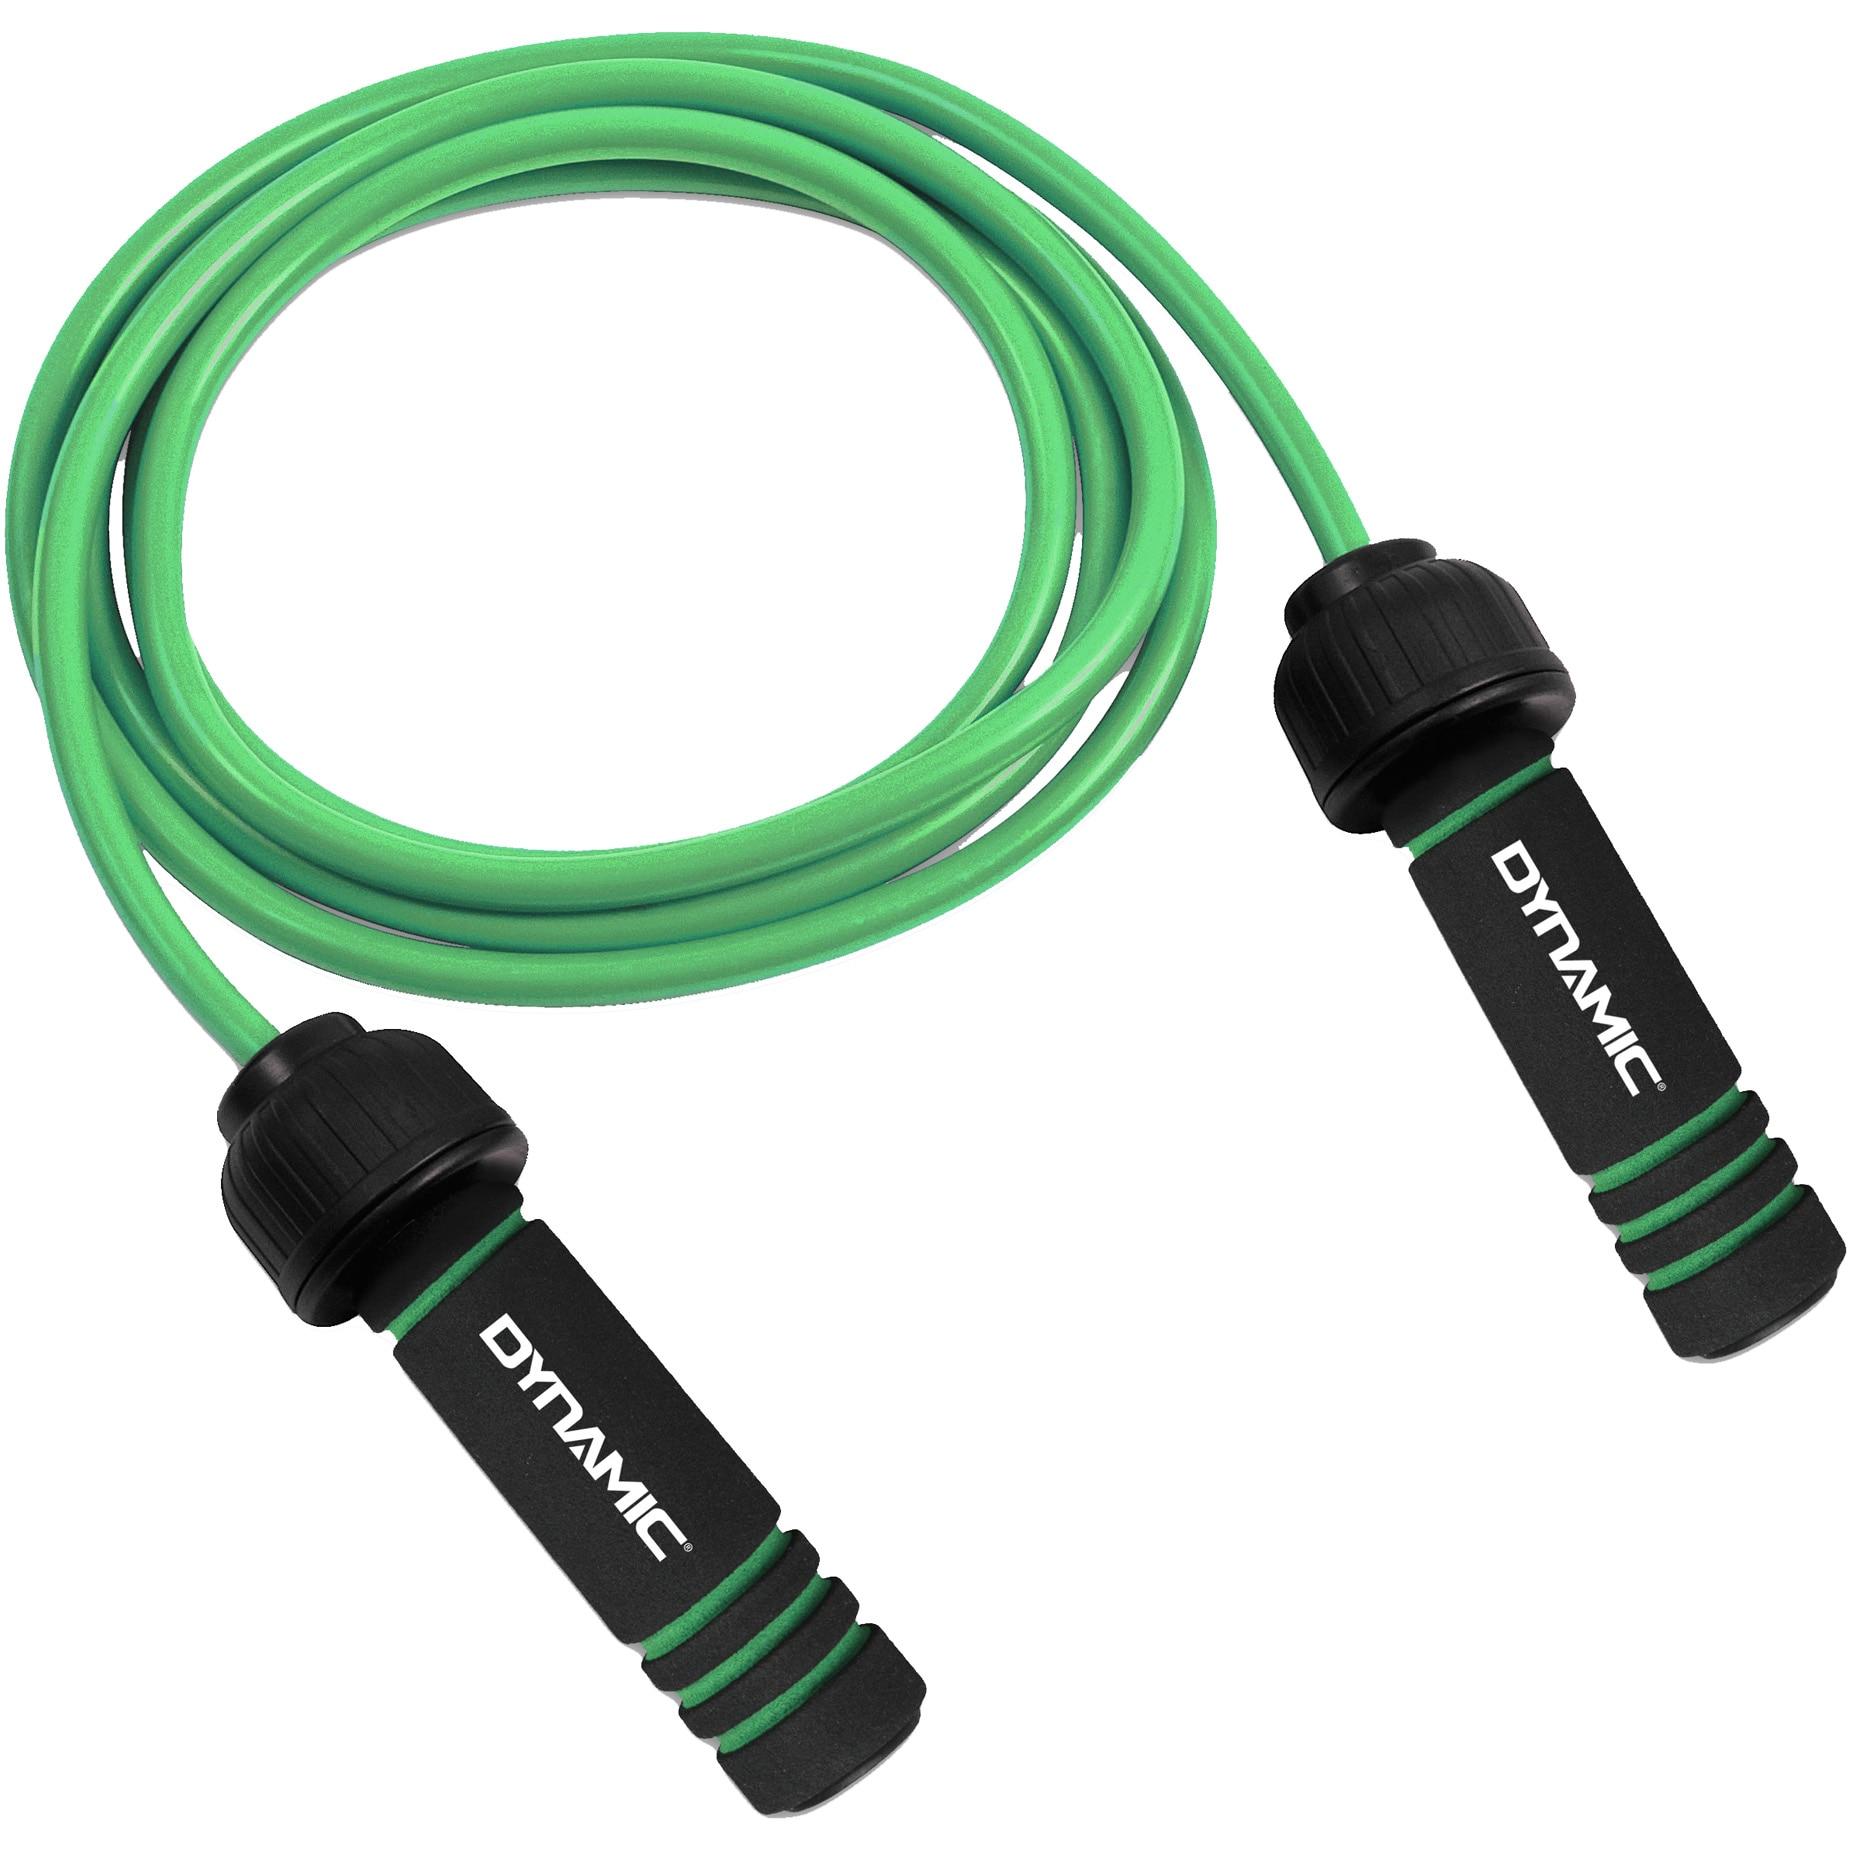 Fotografie Coarda pentru sarit, Dynamic, material: PP+burete, coarda din PVC, 2.7 m, verde